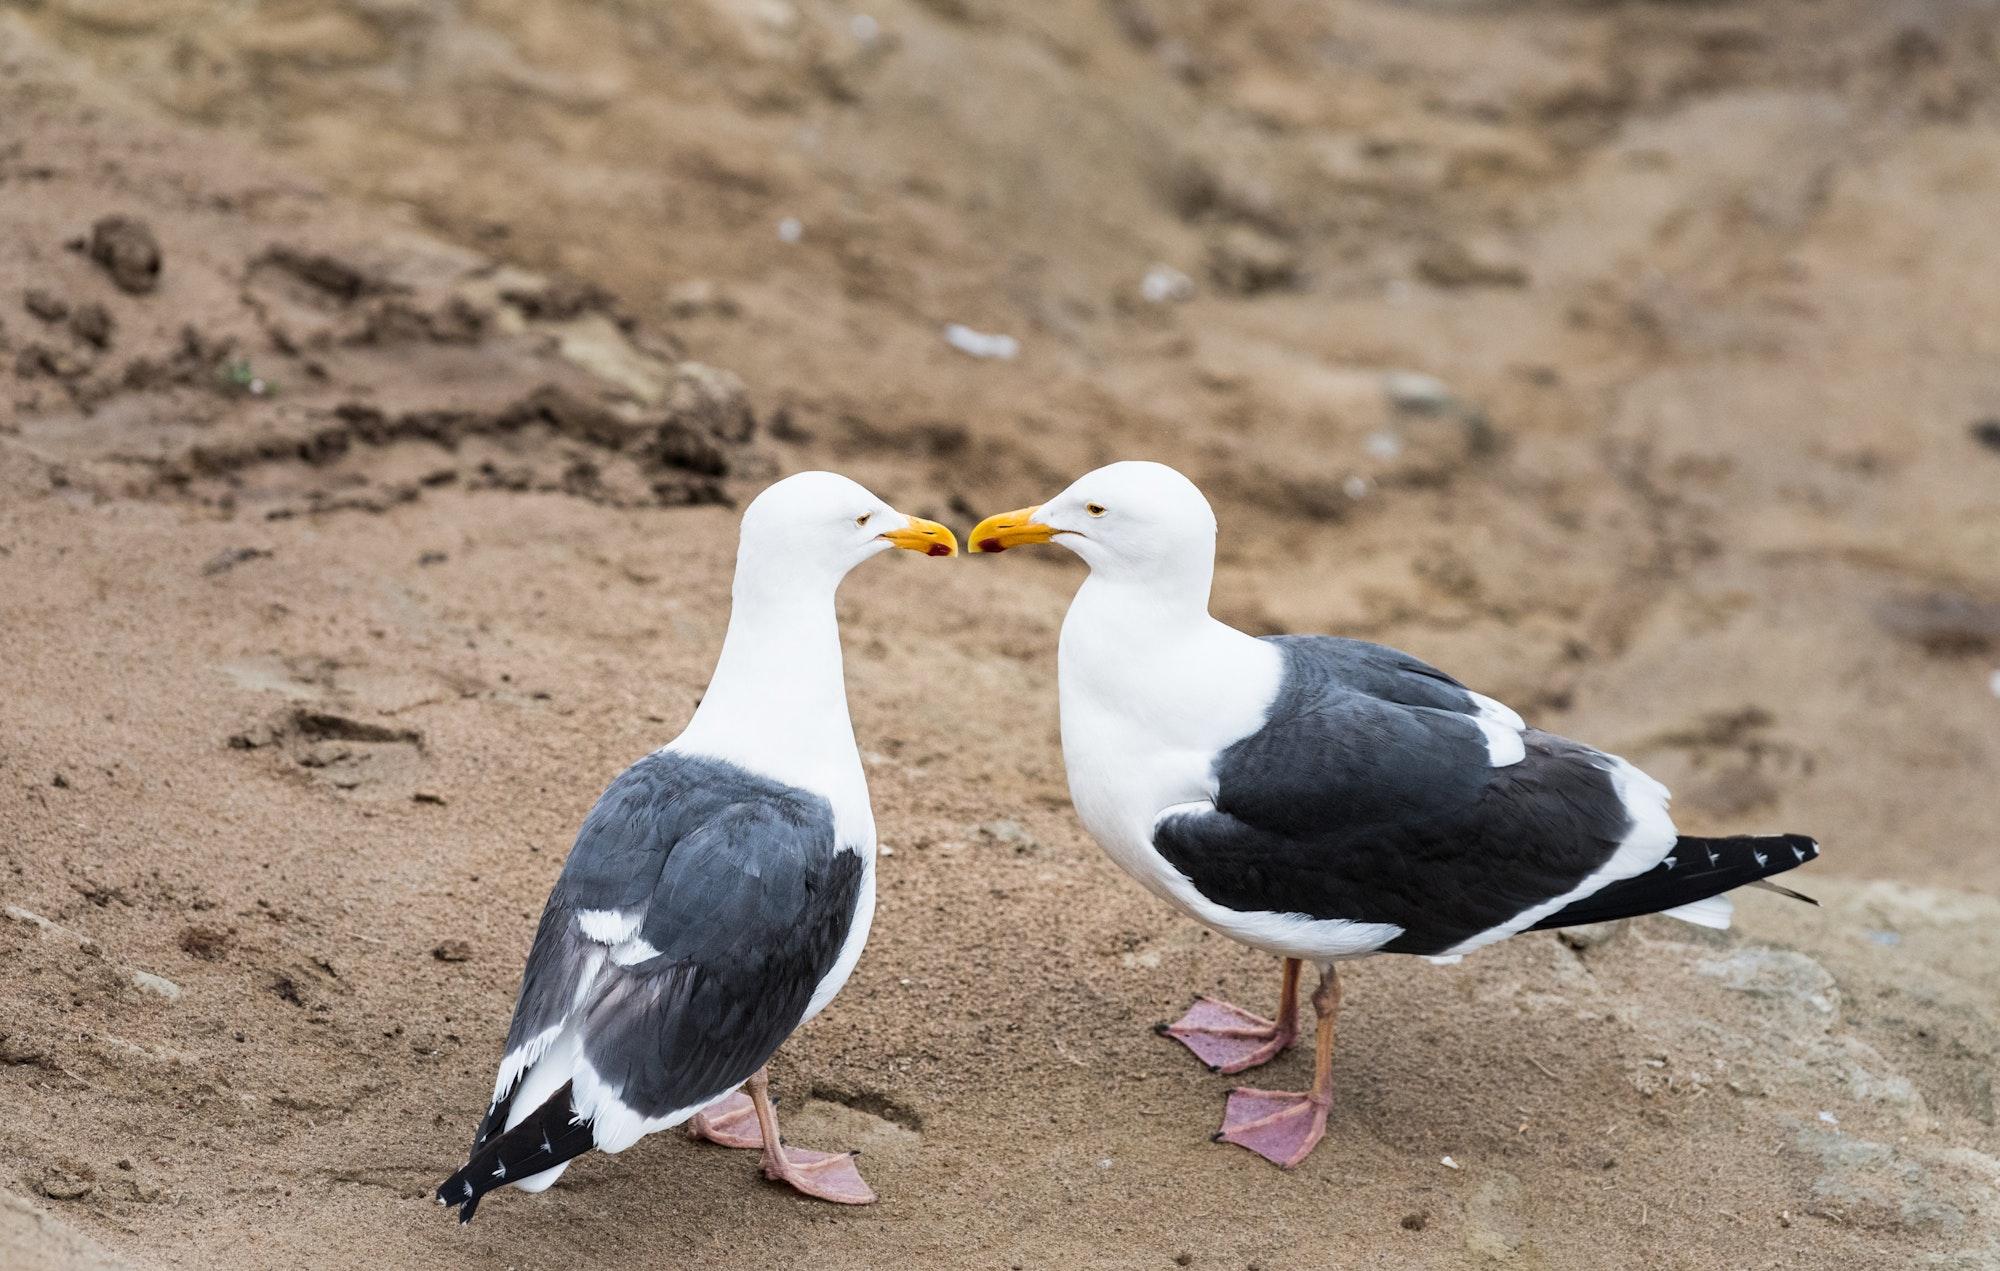 May contain: bird, animal, beak, and seagull